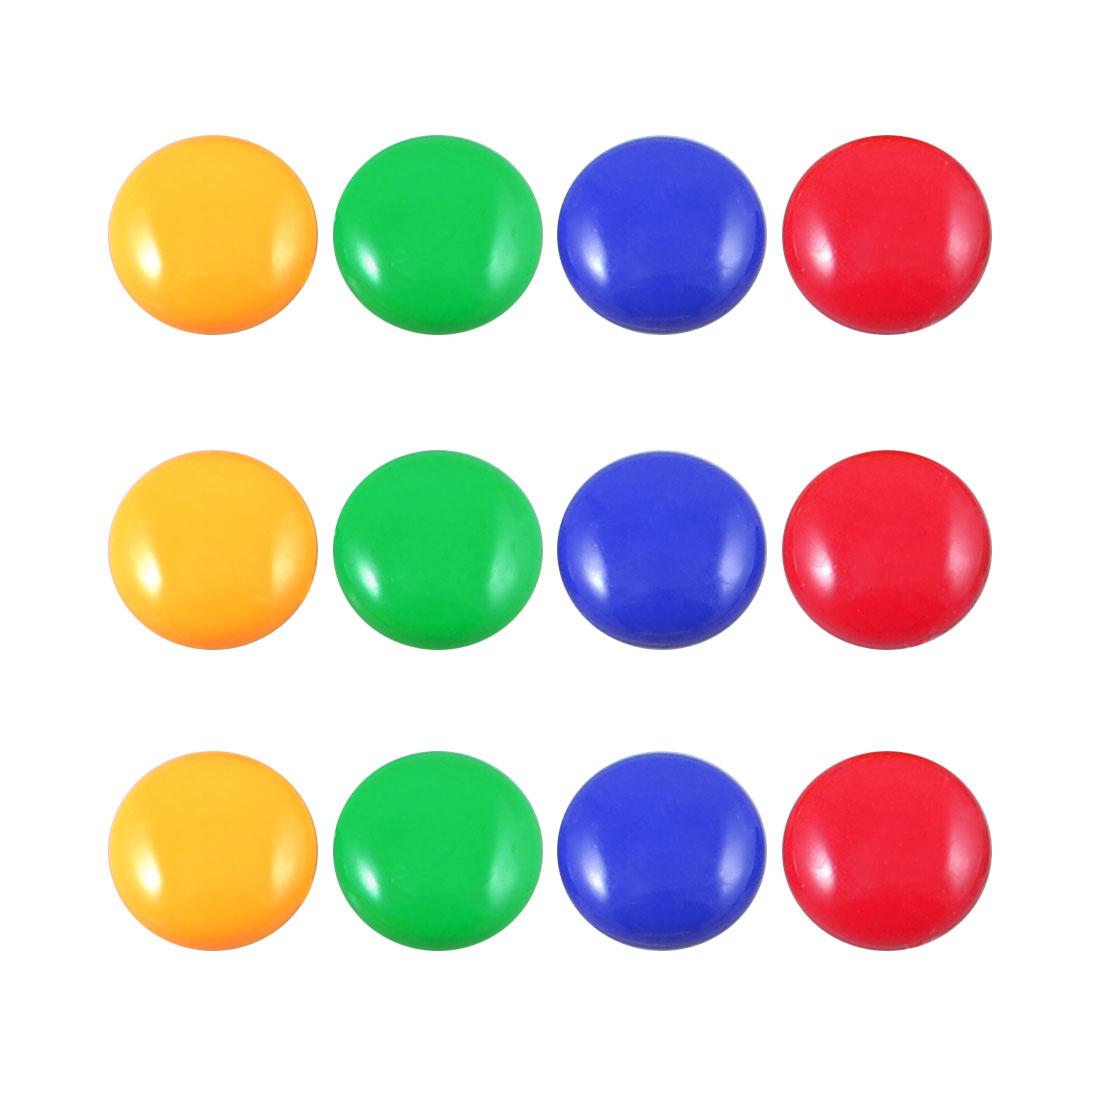 12 Pcs Multicolor 20mm Dia Round Fridge Magnets Paper Holder Set